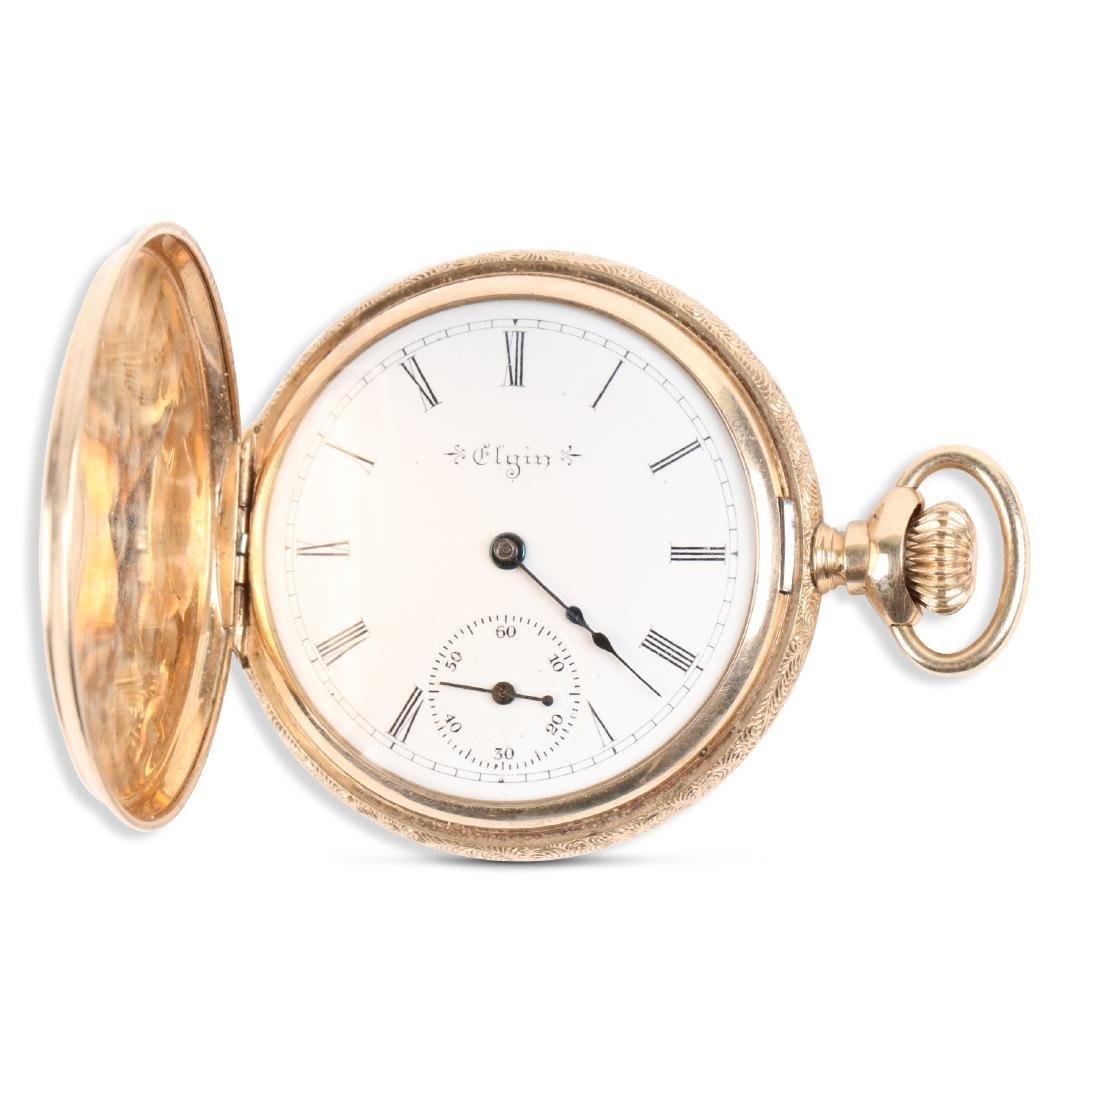 Elgin, 14K Pocket Watch